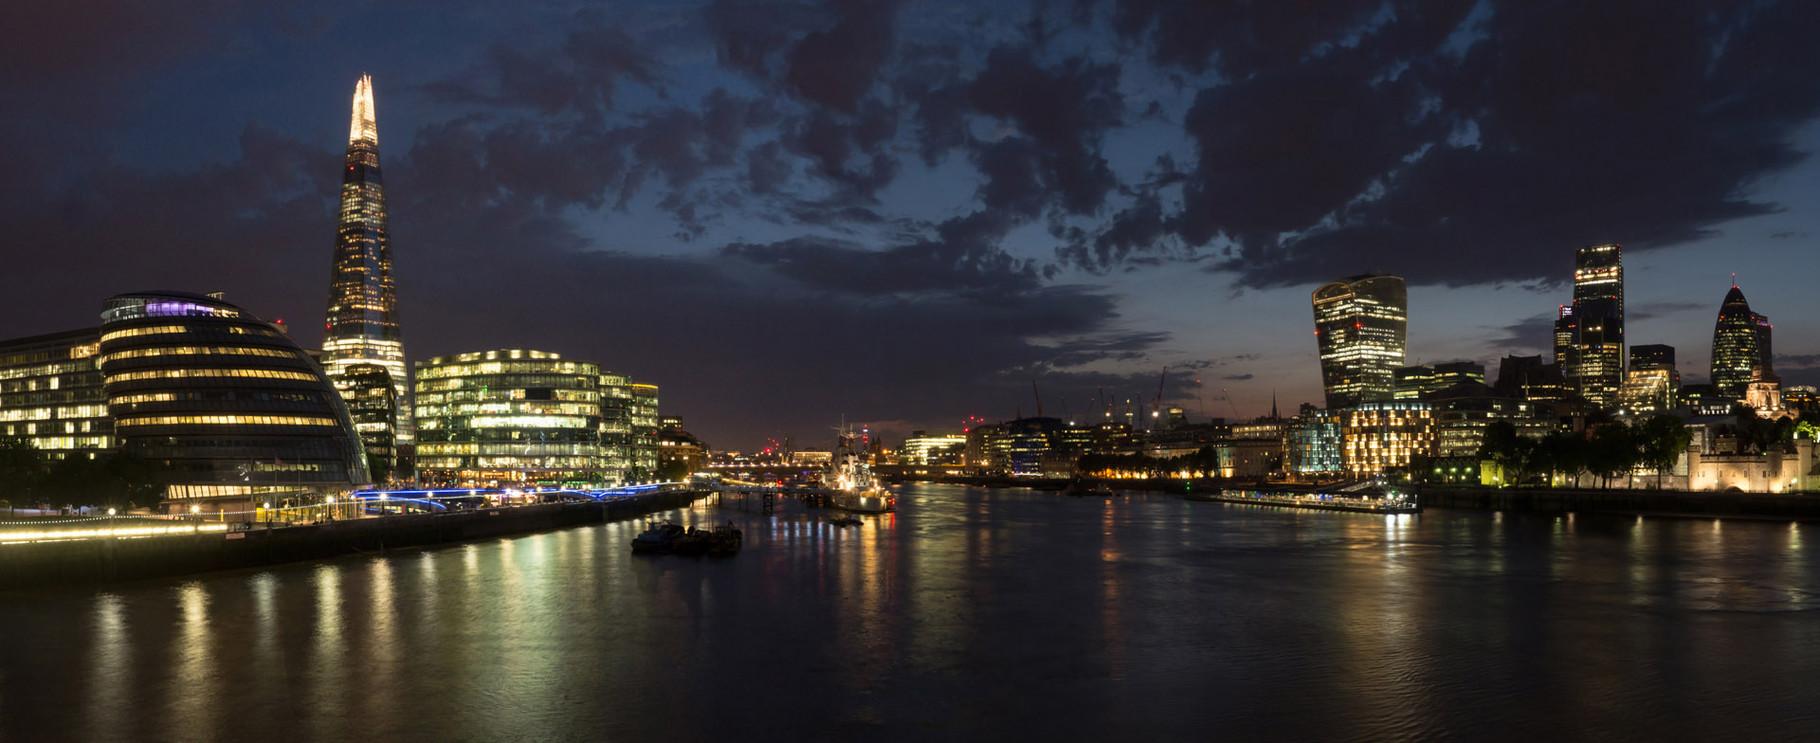 Panoramic view from Tower bridge, London